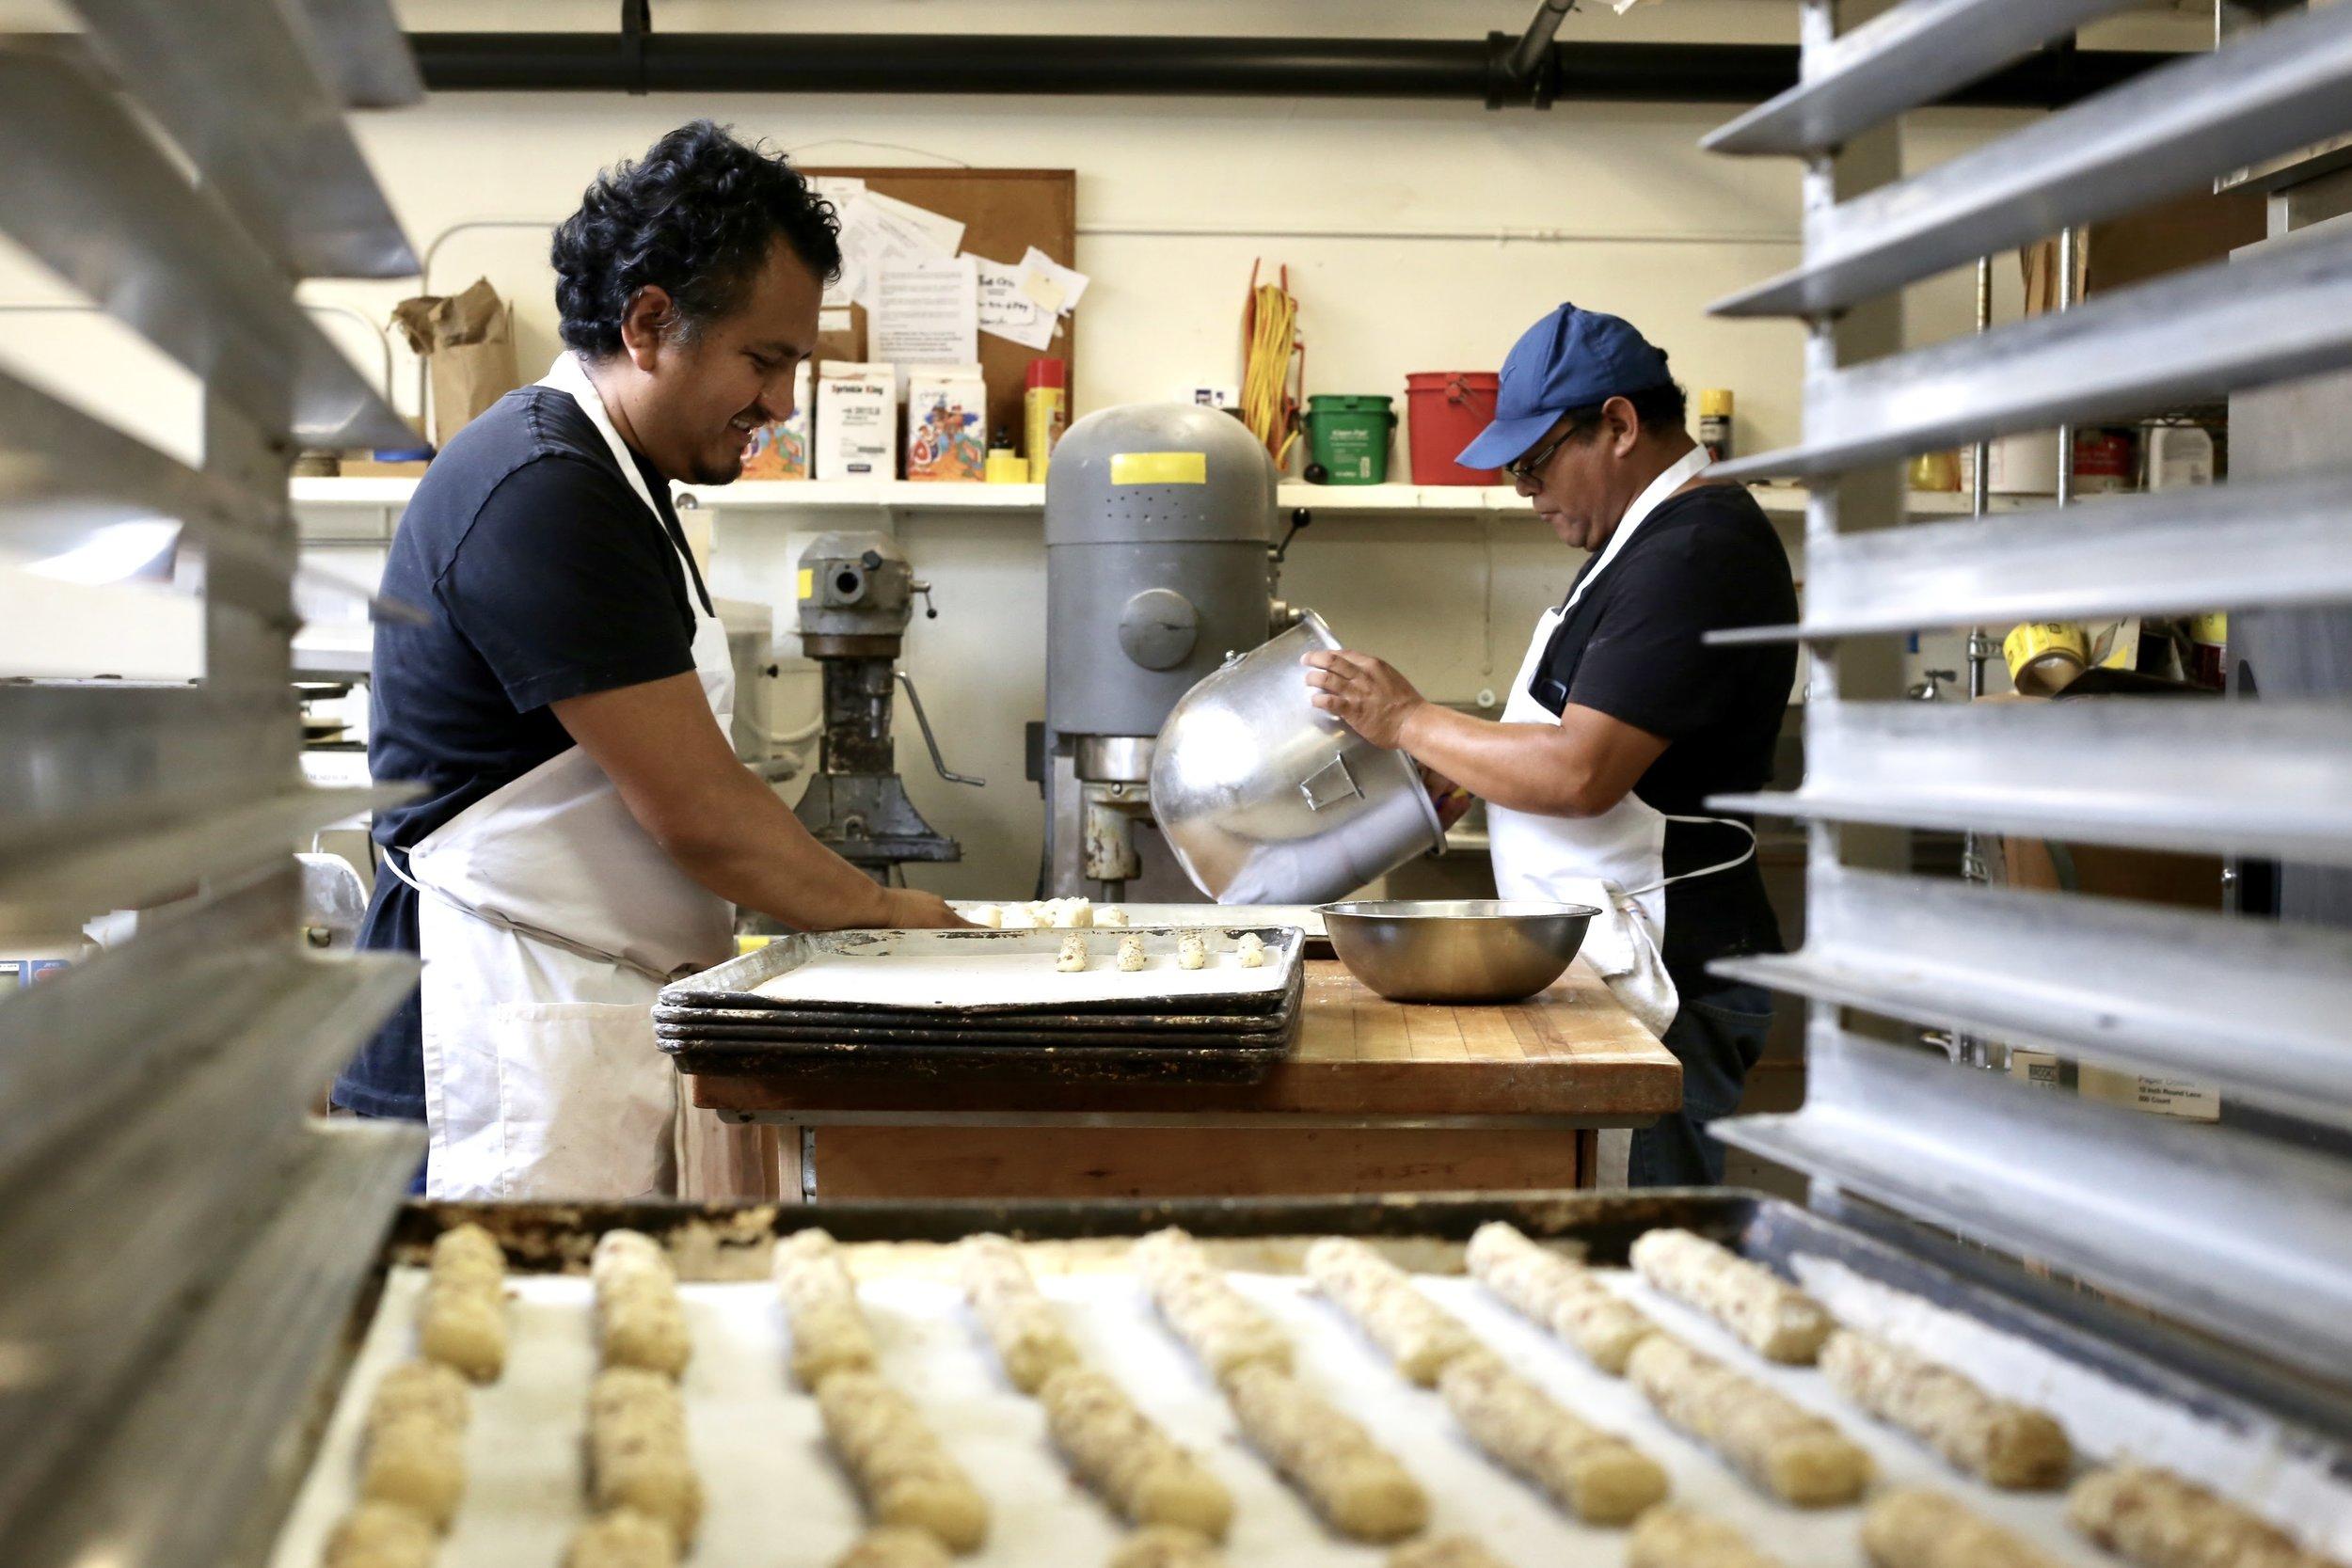 Jose and Epiphano 1 - Grand Bakery.jpeg